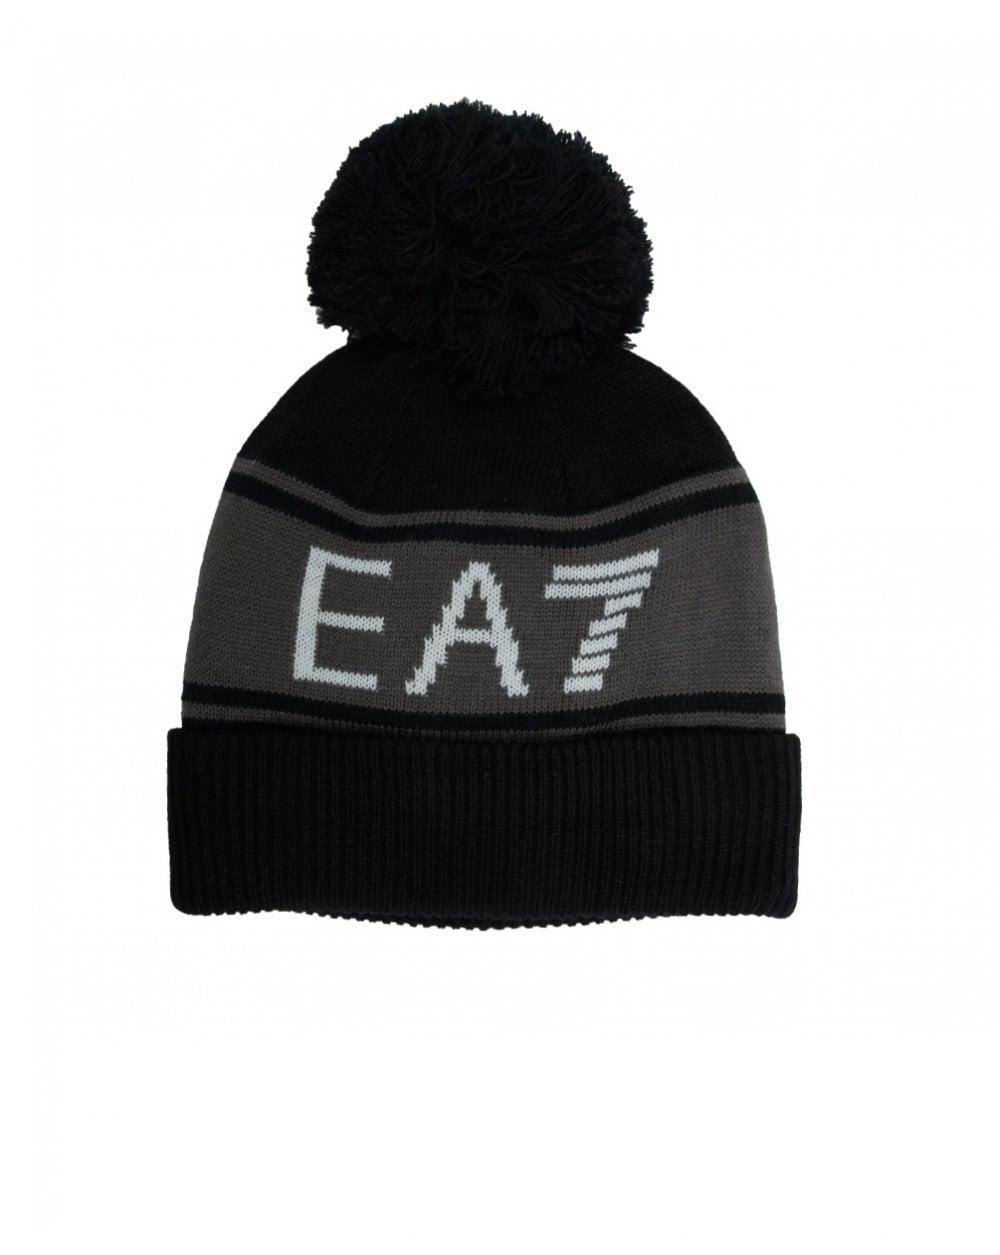 6049389da EA7 - Black Train Visibility Bobble Beanie Hat for Men - Lyst. View  fullscreen